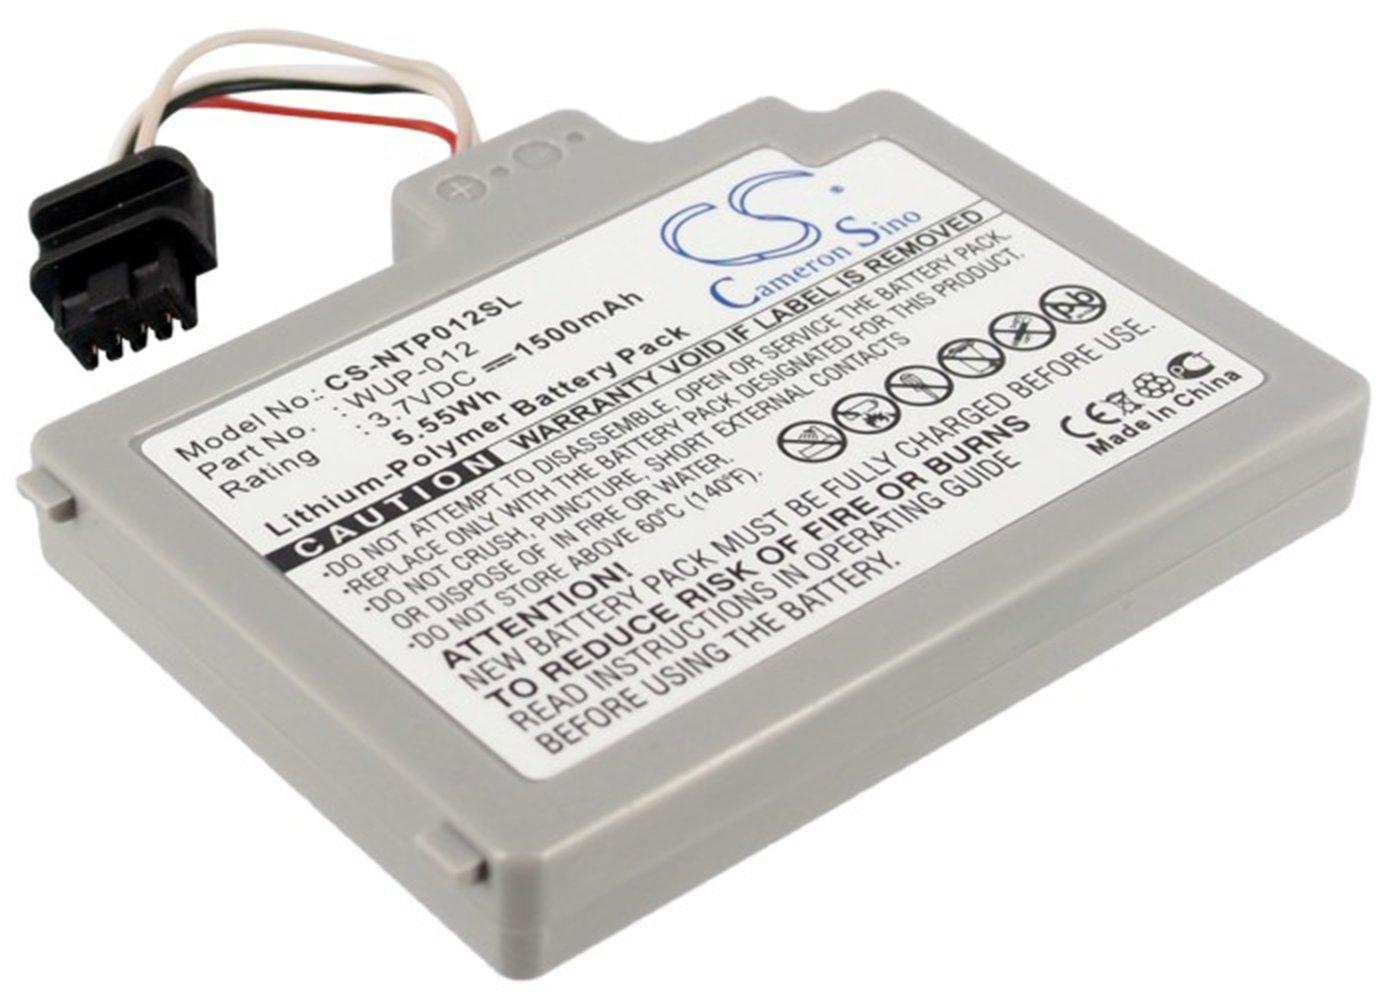 Battery2go Li-ion BATTERY Pack Fits Ninetendo WUP-012, WUP-010, Wii U, Wii U GamePad